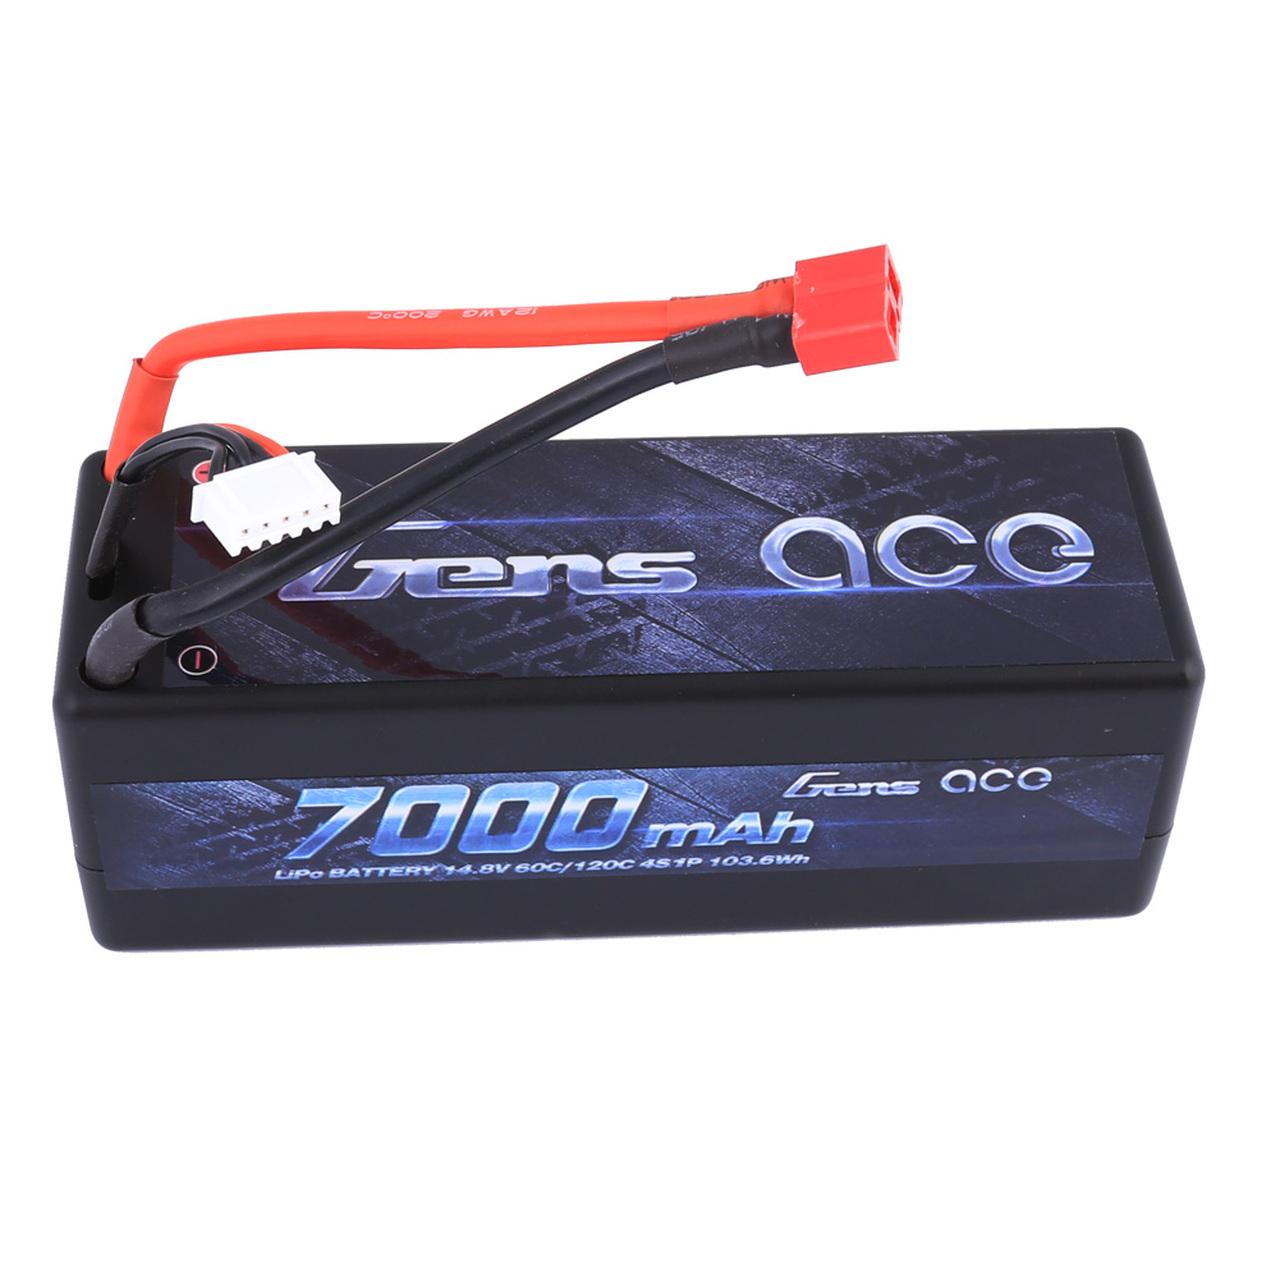 Gens ace 7000mAh 14.8V 60C 4S1P HardCase Lipo Battery 14# with Deans Plug